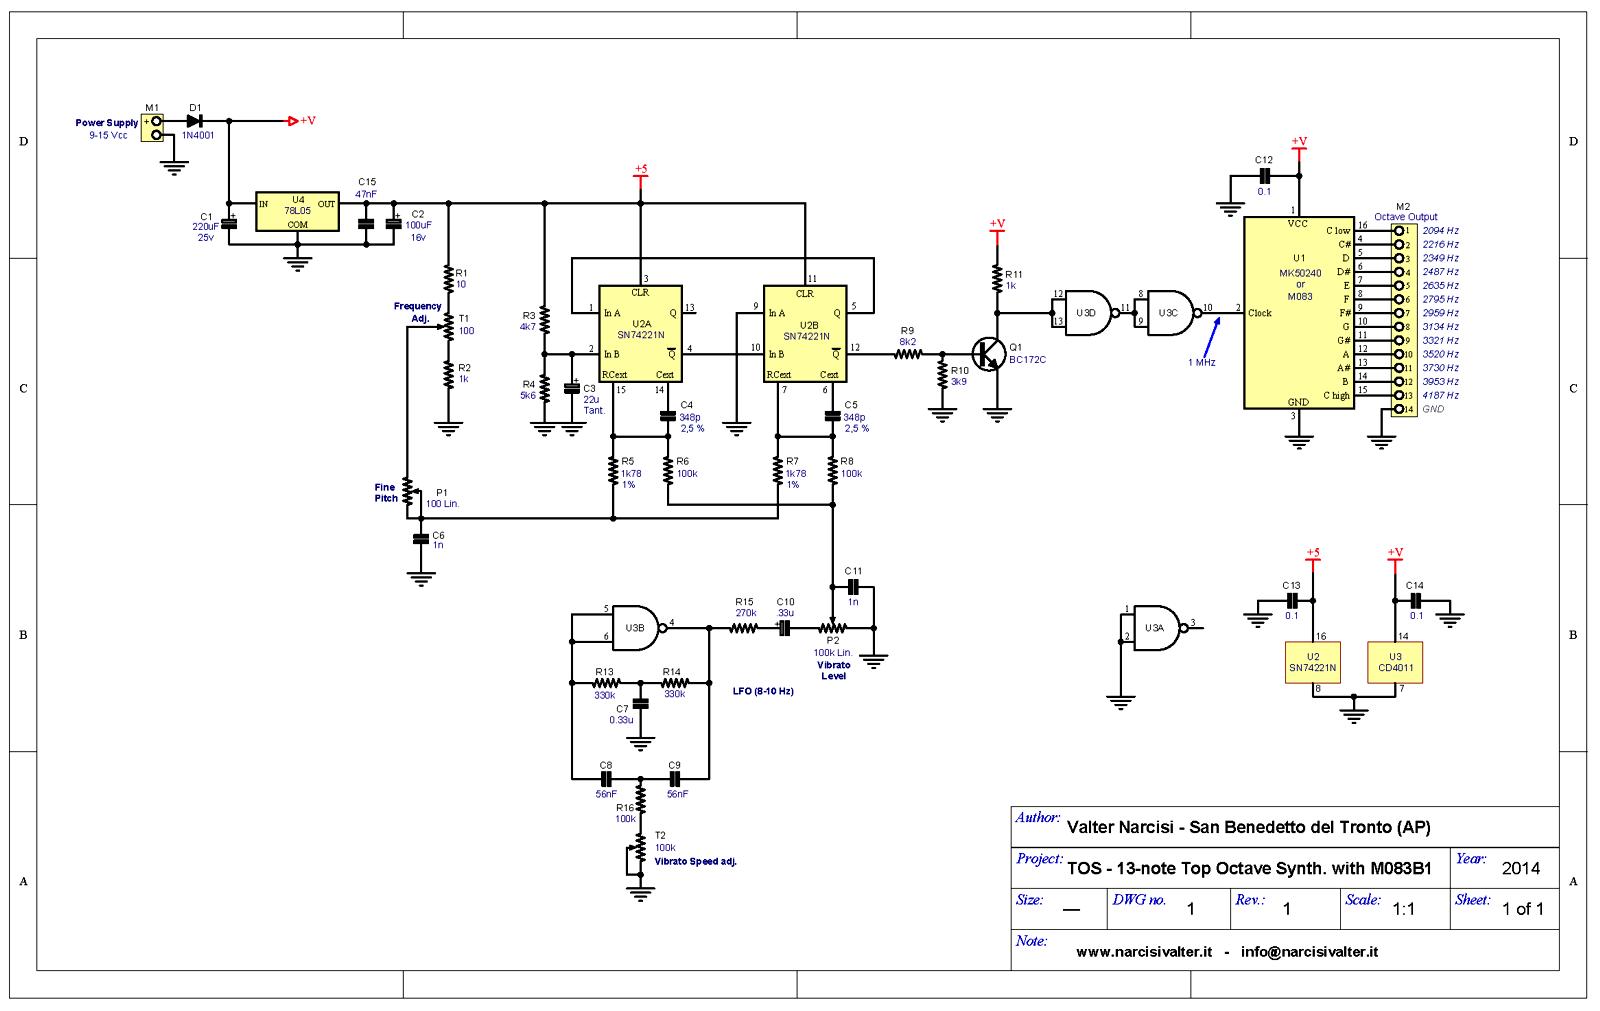 Generatori Ultrasuoni Schemi Elettrici : Tos note top octave generator with m b